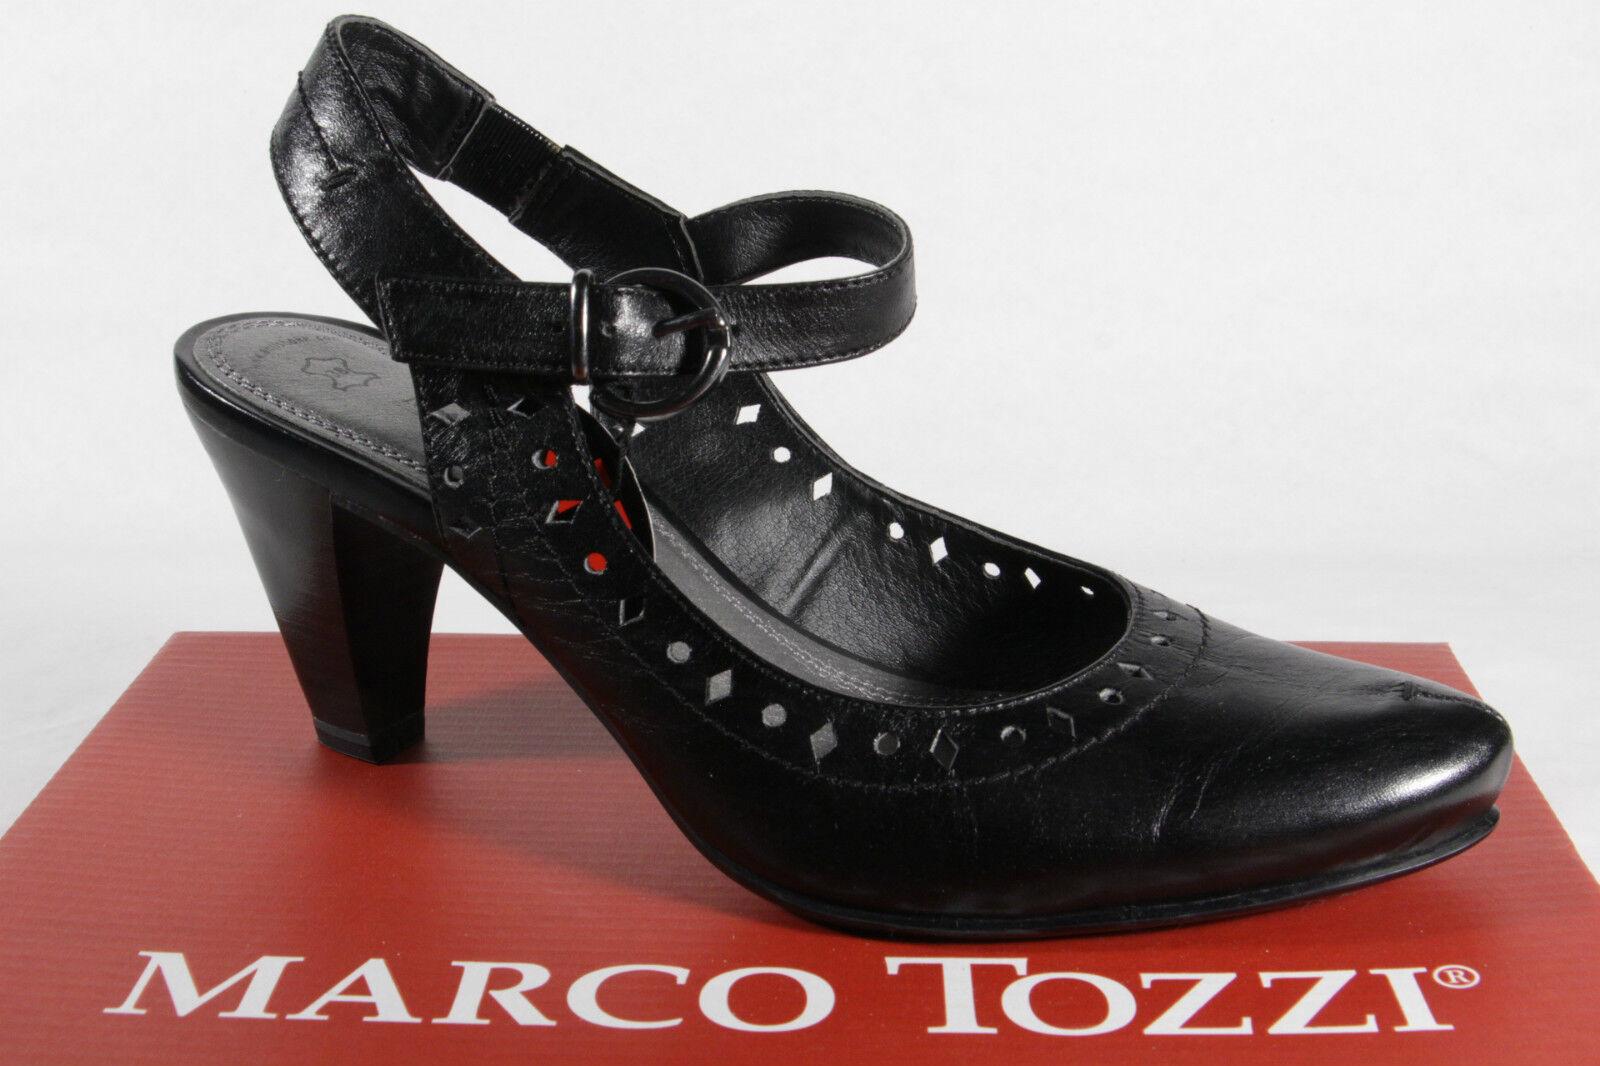 Marco Tozzi Damen Sandale Sling Echtleder schwarz NEU